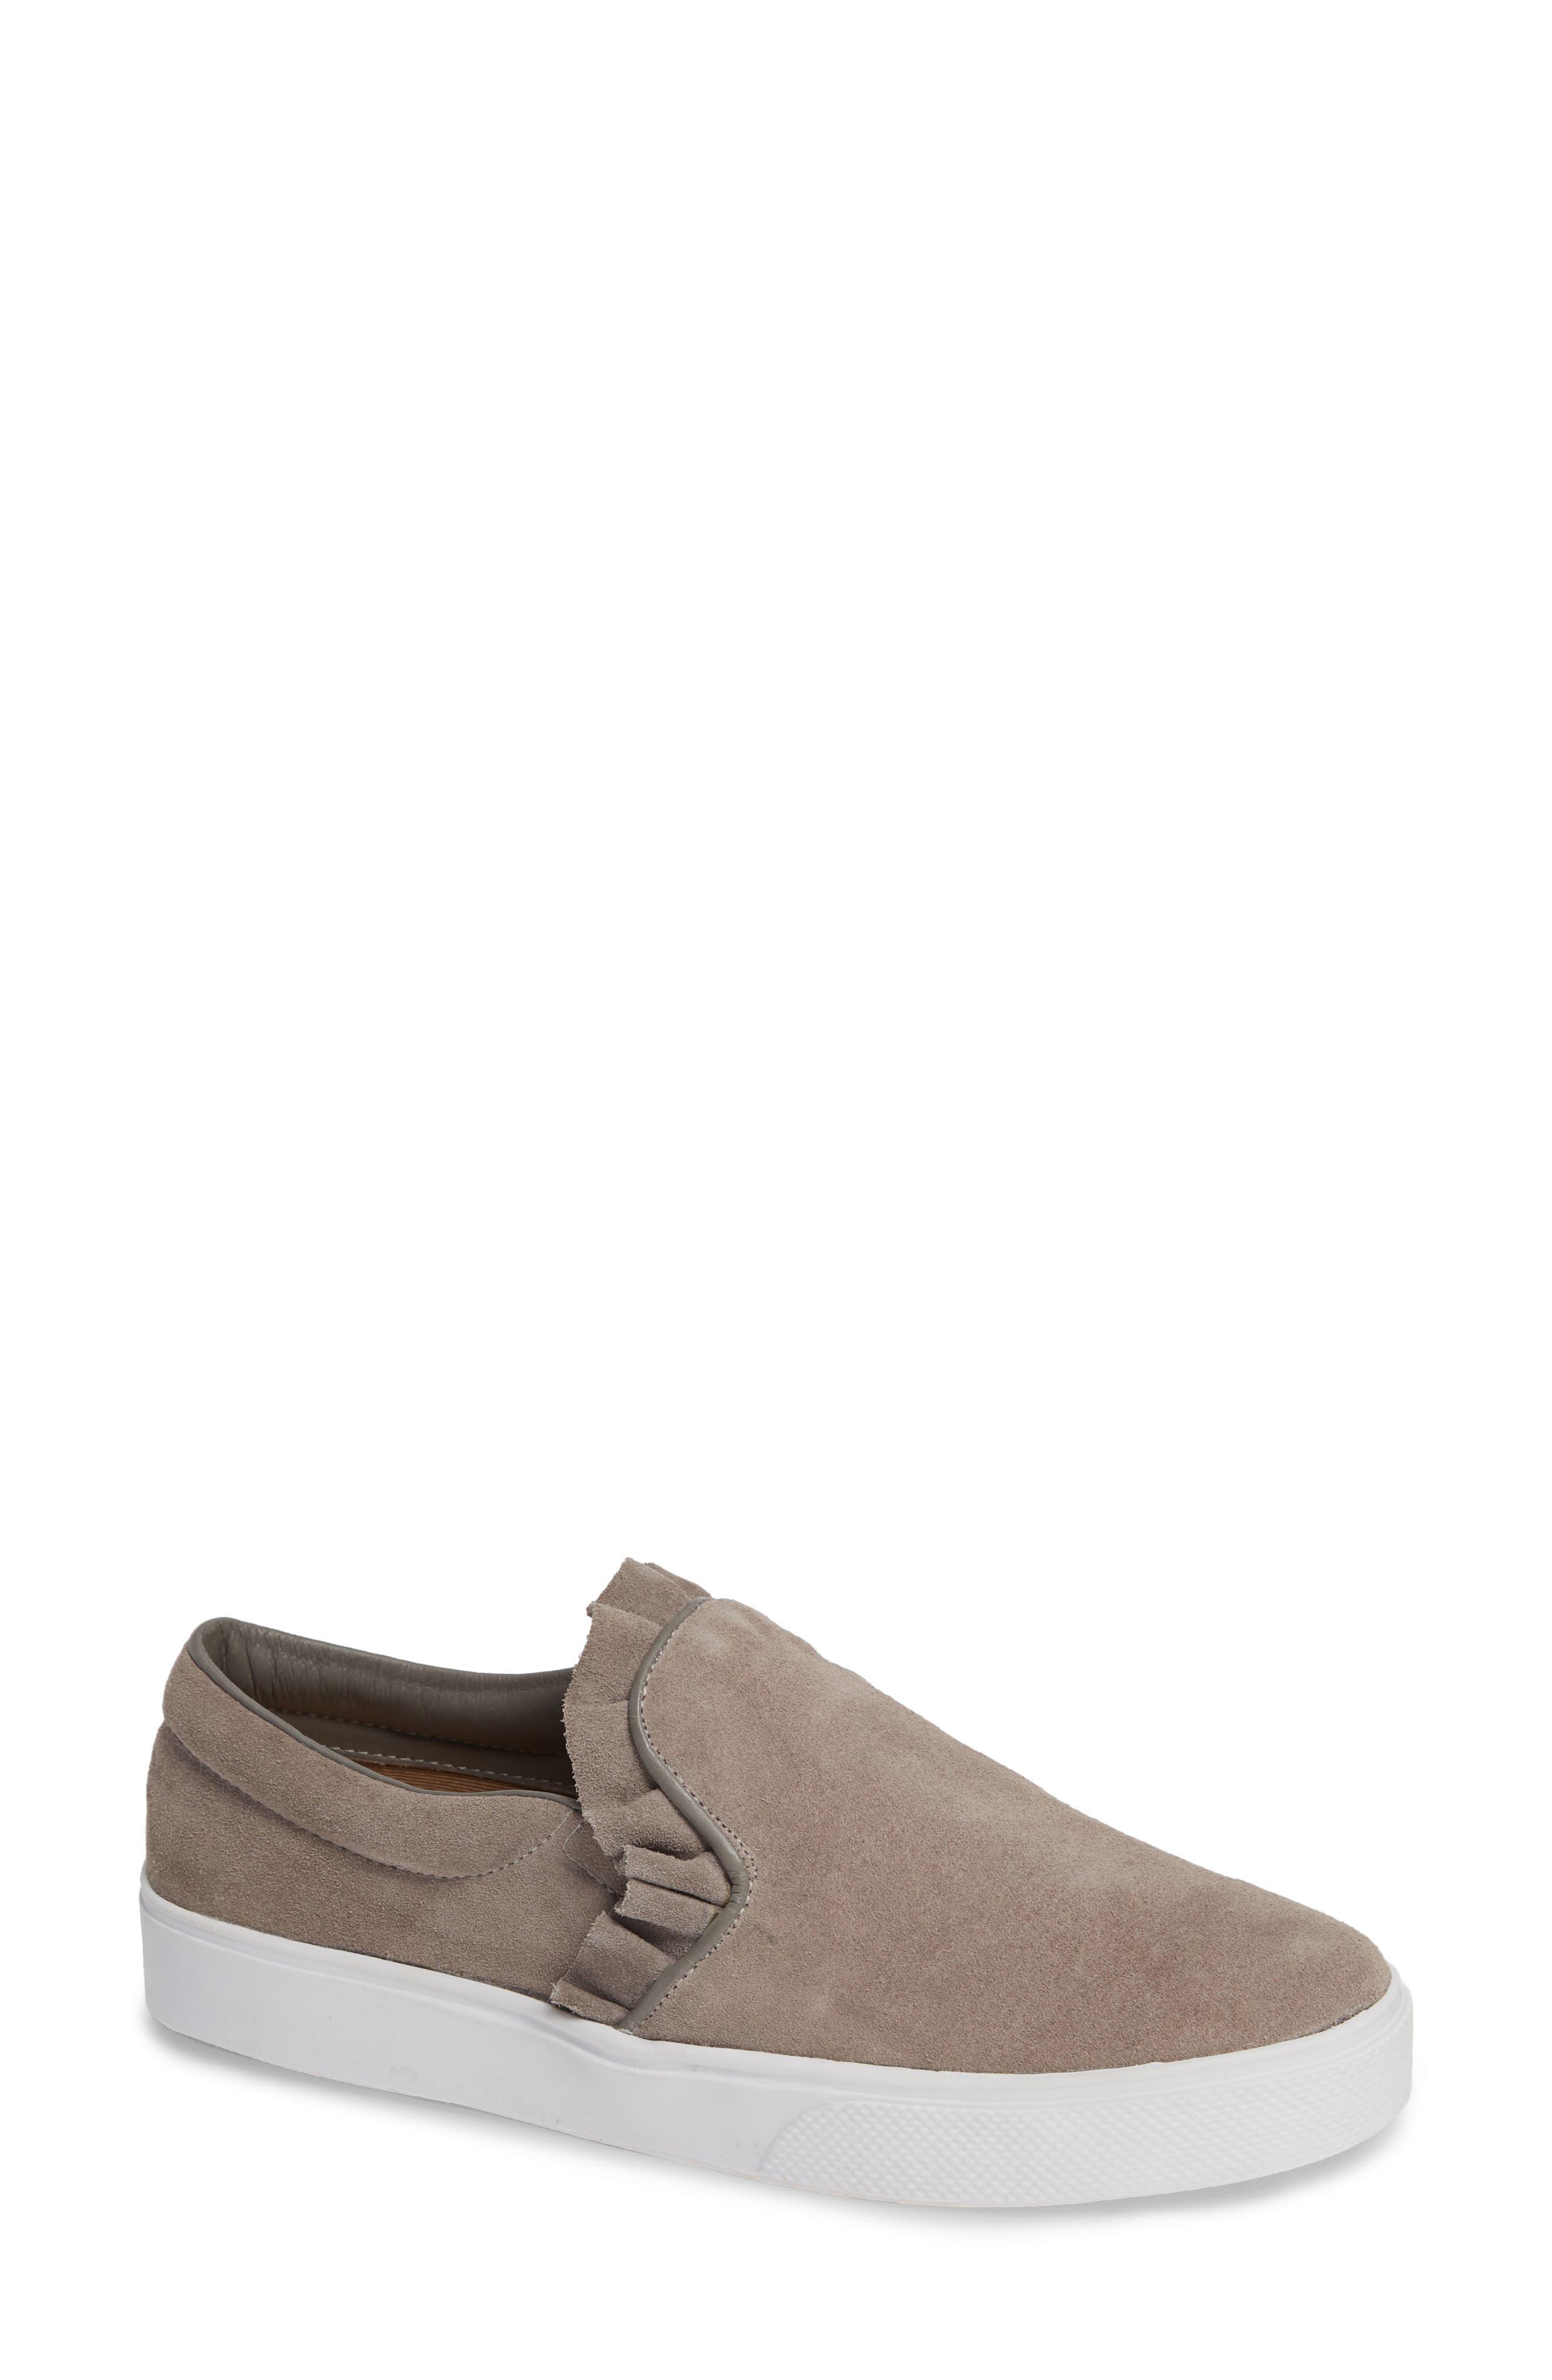 KAANAS Trento Ruffle Sneaker in Grey Suede